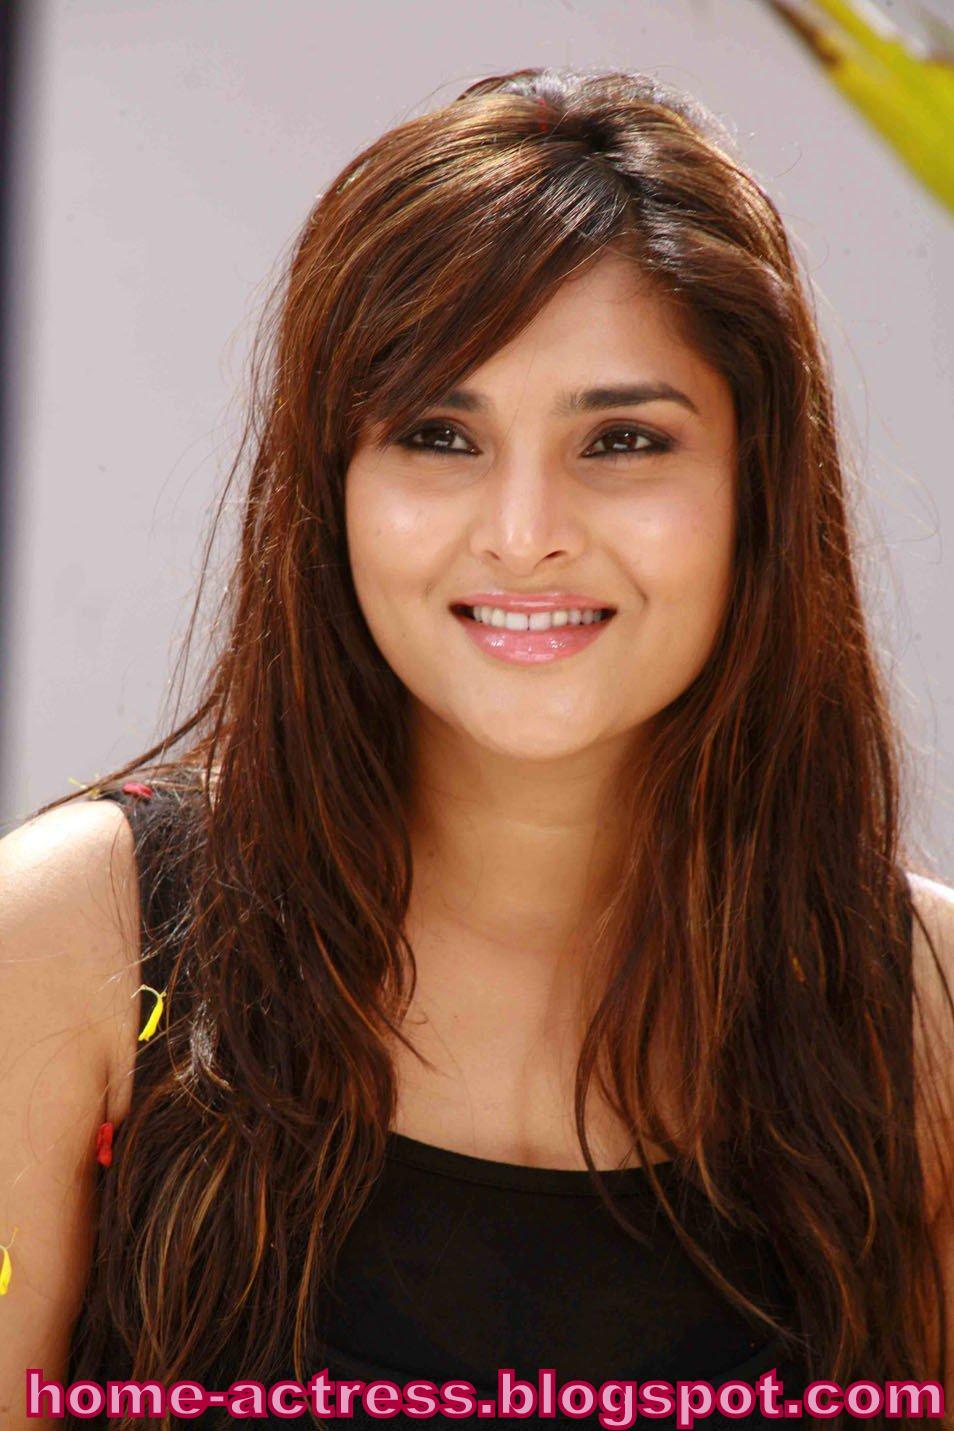 Home Actress Blogspot Com Colours Swathi: Home-actress.blogspot.com: Divya Spandana ( Ramya